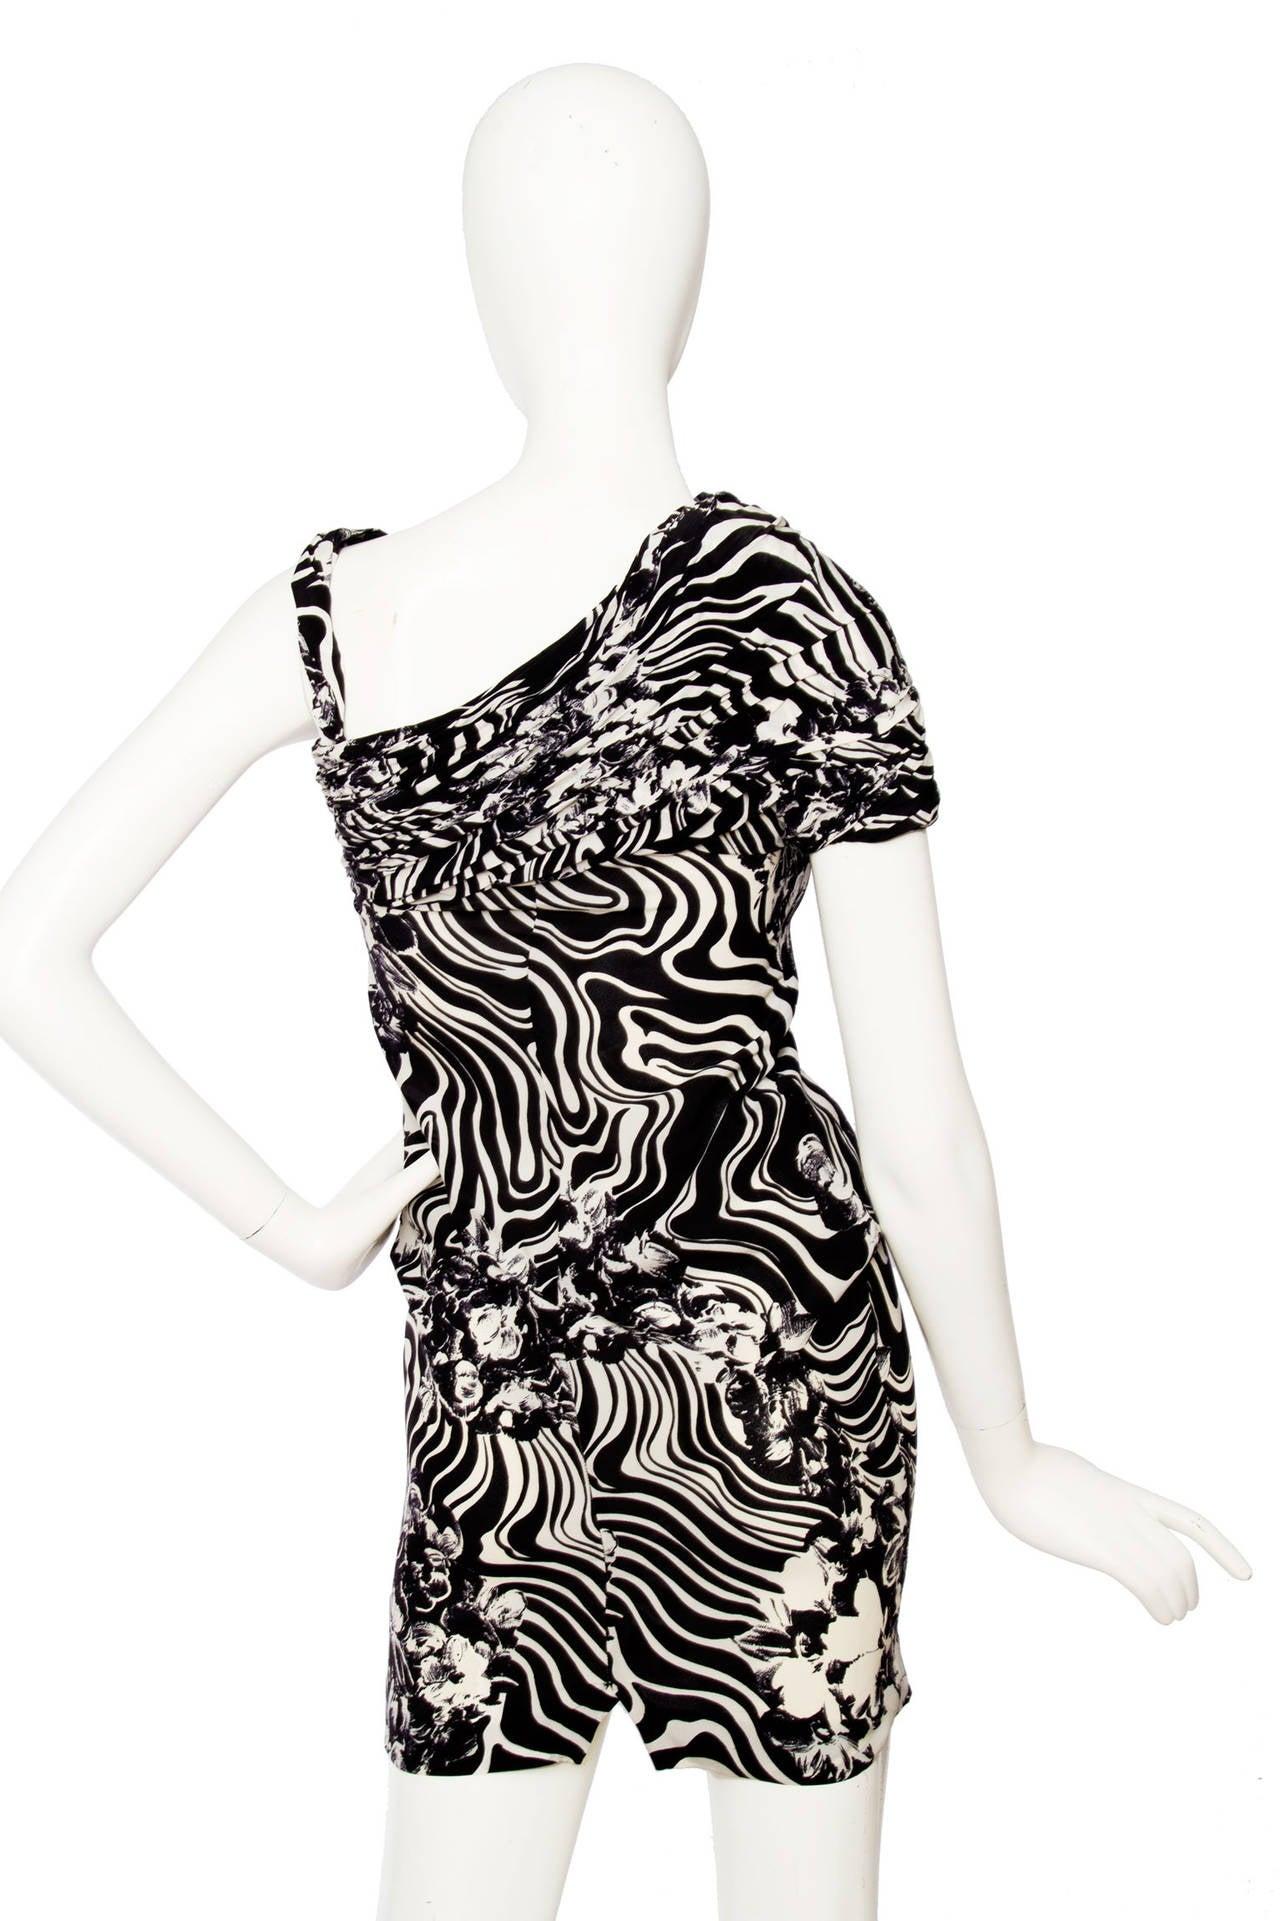 1980s Gianni Versace Monochrome Silk Dress 4